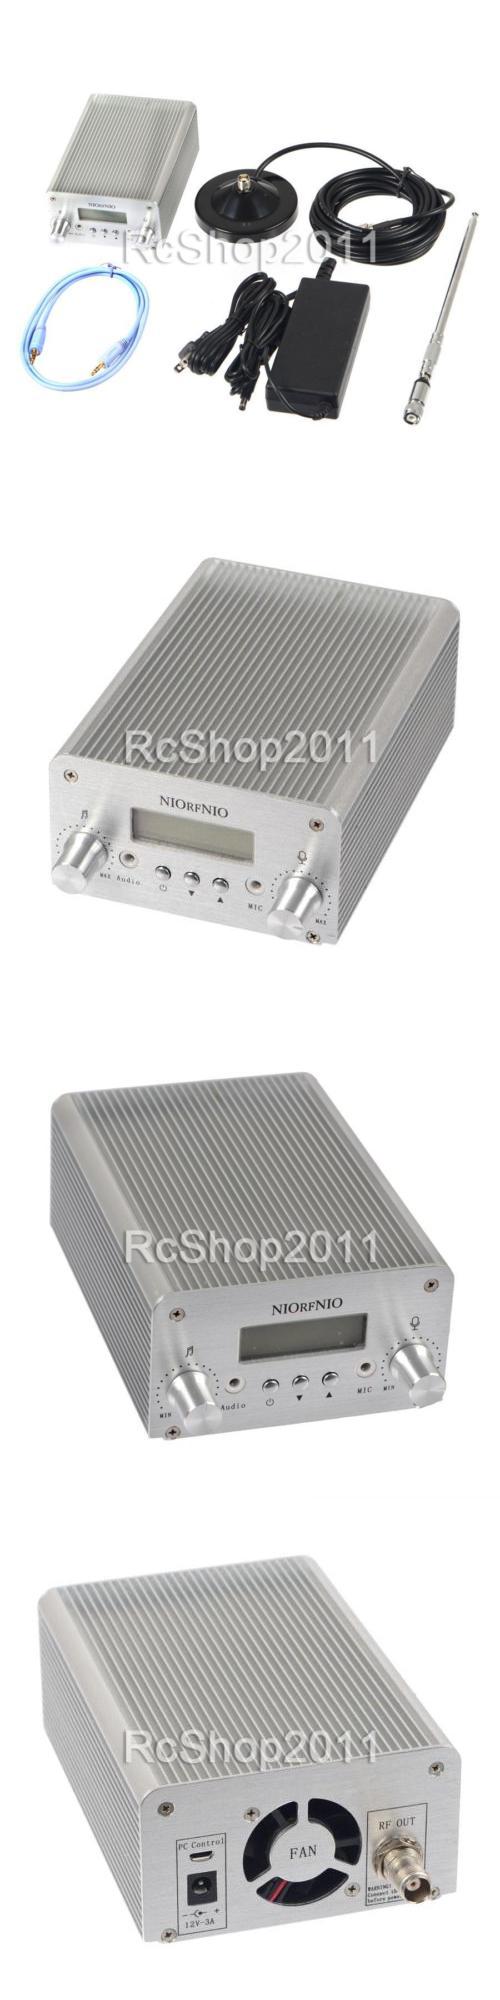 Ham Radio Transmitters: 5W / 15W Pll Fm Transmitter Radio Stereo Station Wireless Broadcast+Tnc Antenna -> BUY IT NOW ONLY: $117.99 on eBay!